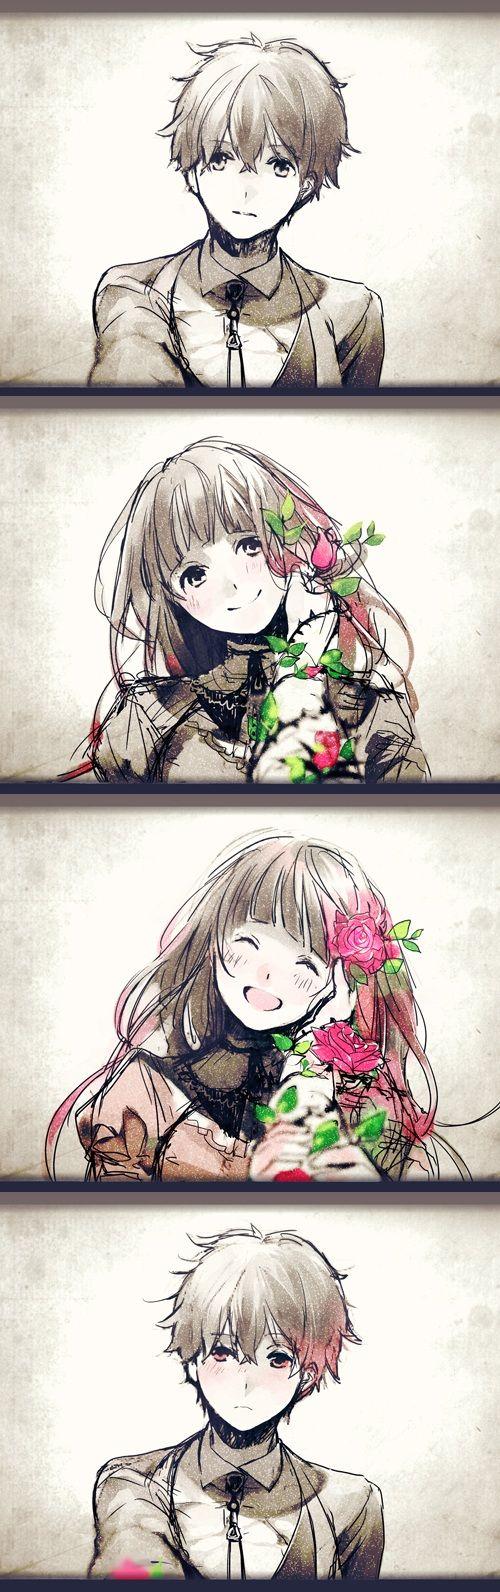 Tags: Anime, Comic, Artist Request, Hyouka, Chitanda Eru